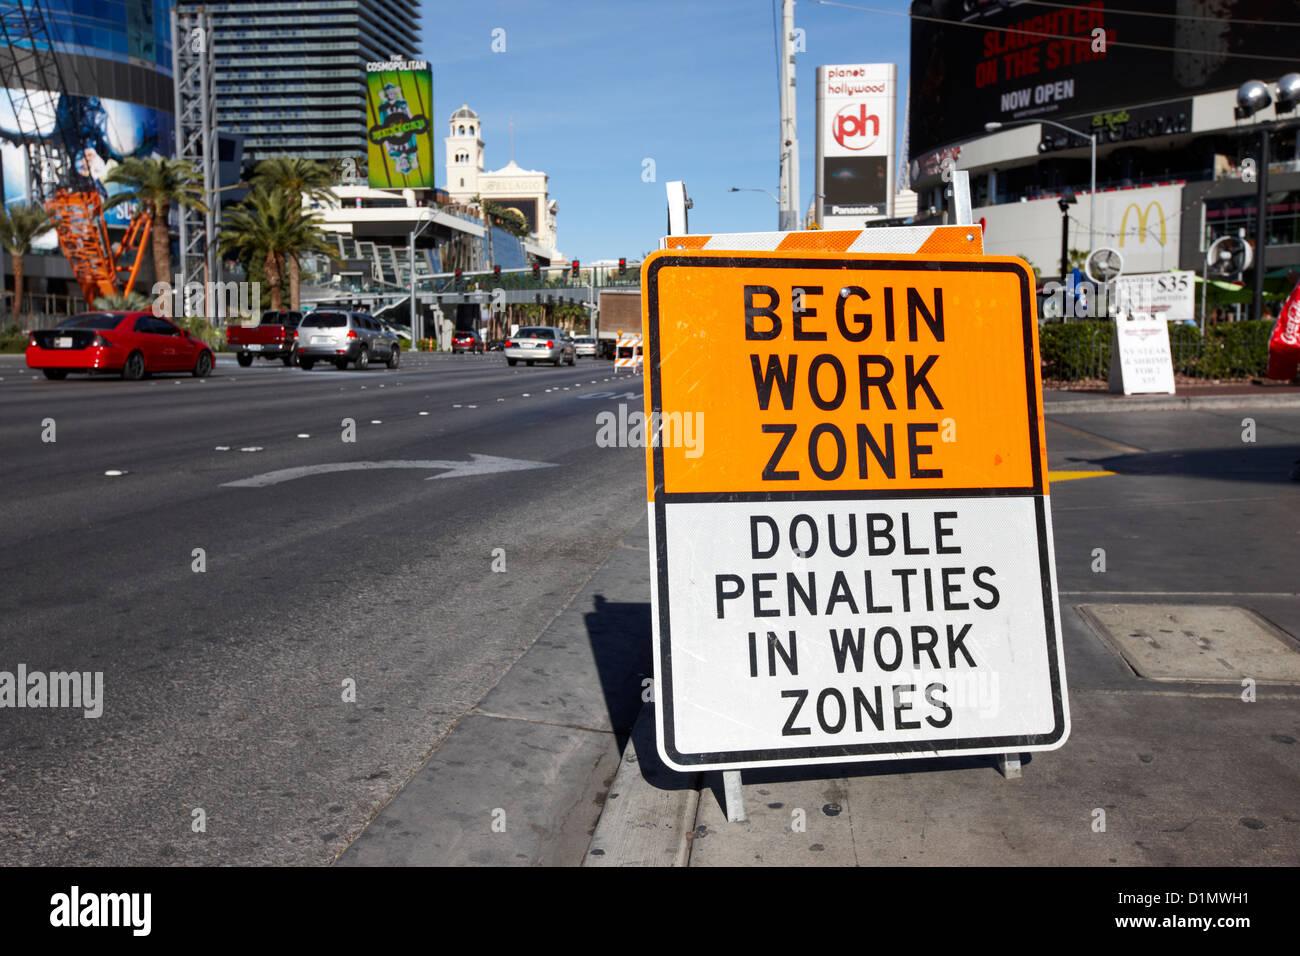 begin work zone double penalties roadsign on Las Vegas boulevard Nevada USA - Stock Image